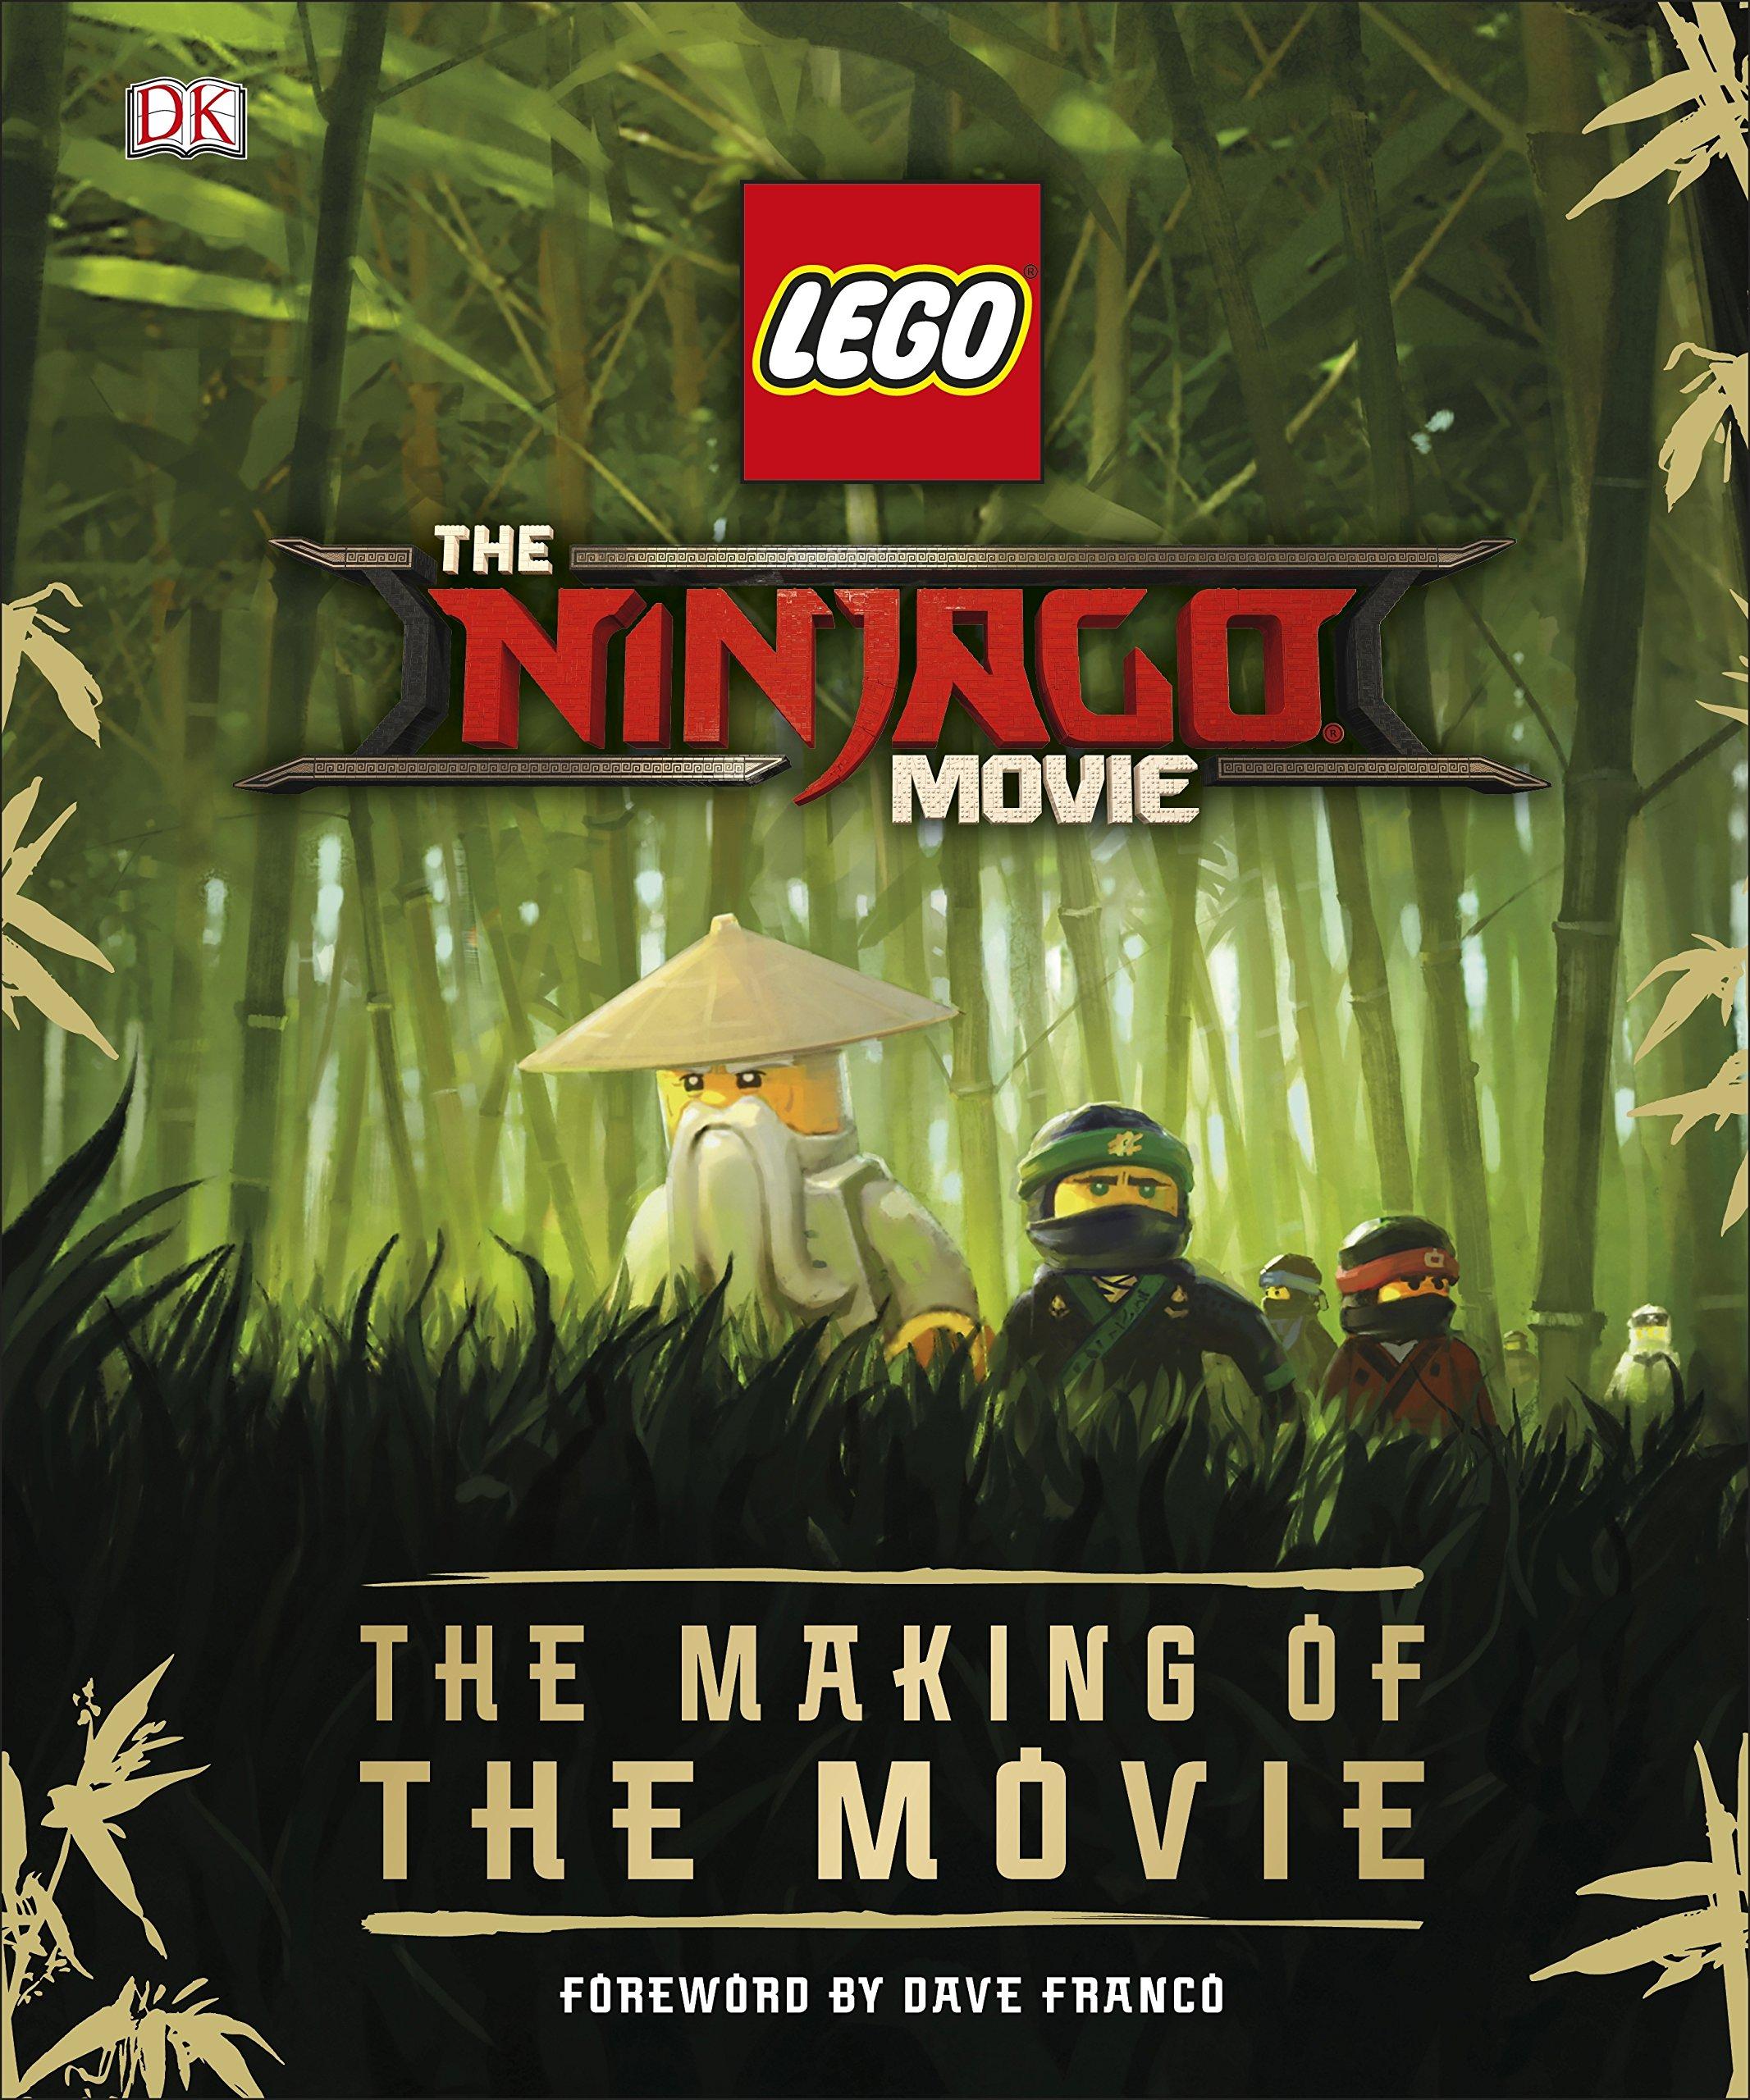 The LEGO (R) NINJAGO (R) Movie (TM) The Making of the Movie ...